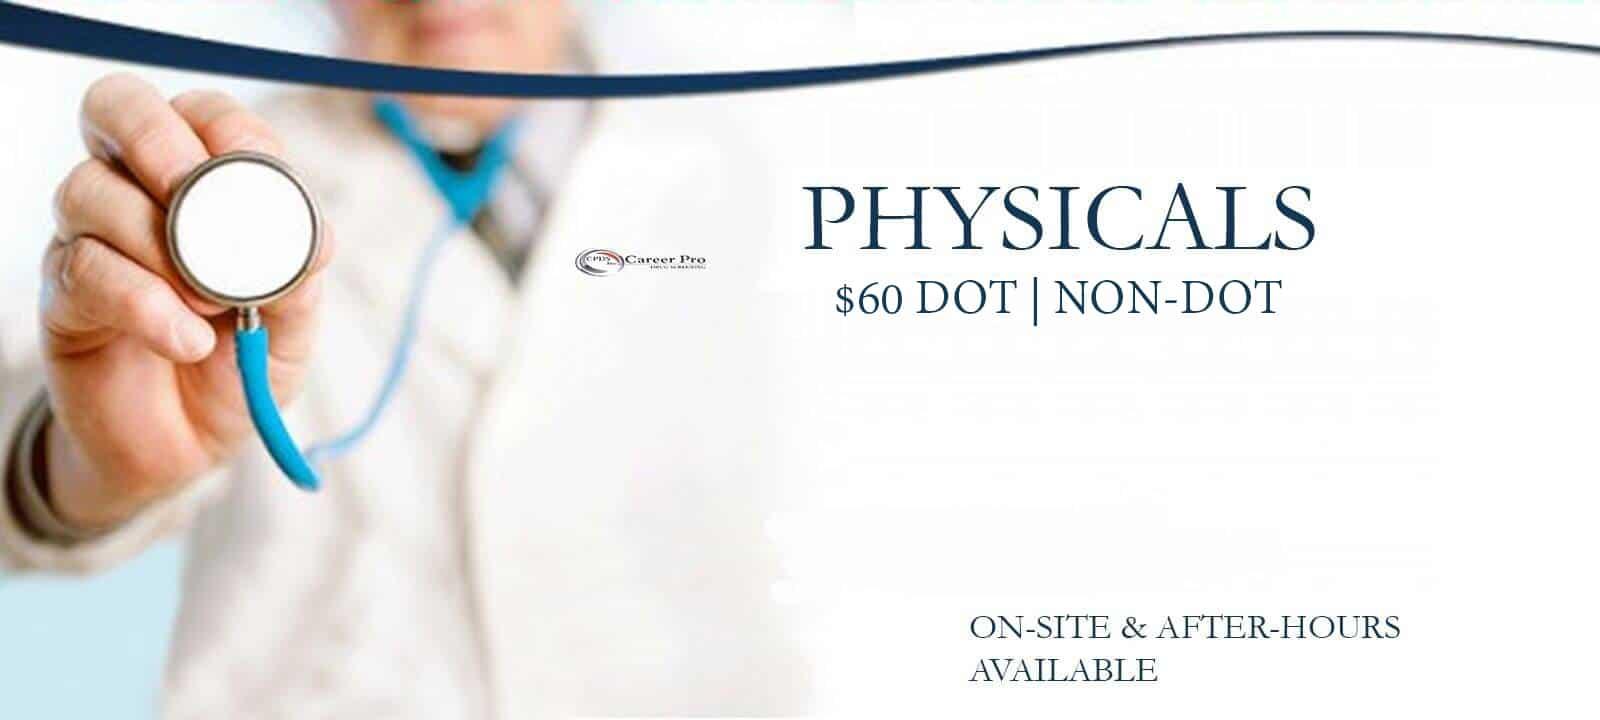 DOT Physicals Memphis | 901-888-1131 Career Pro Drug Screening